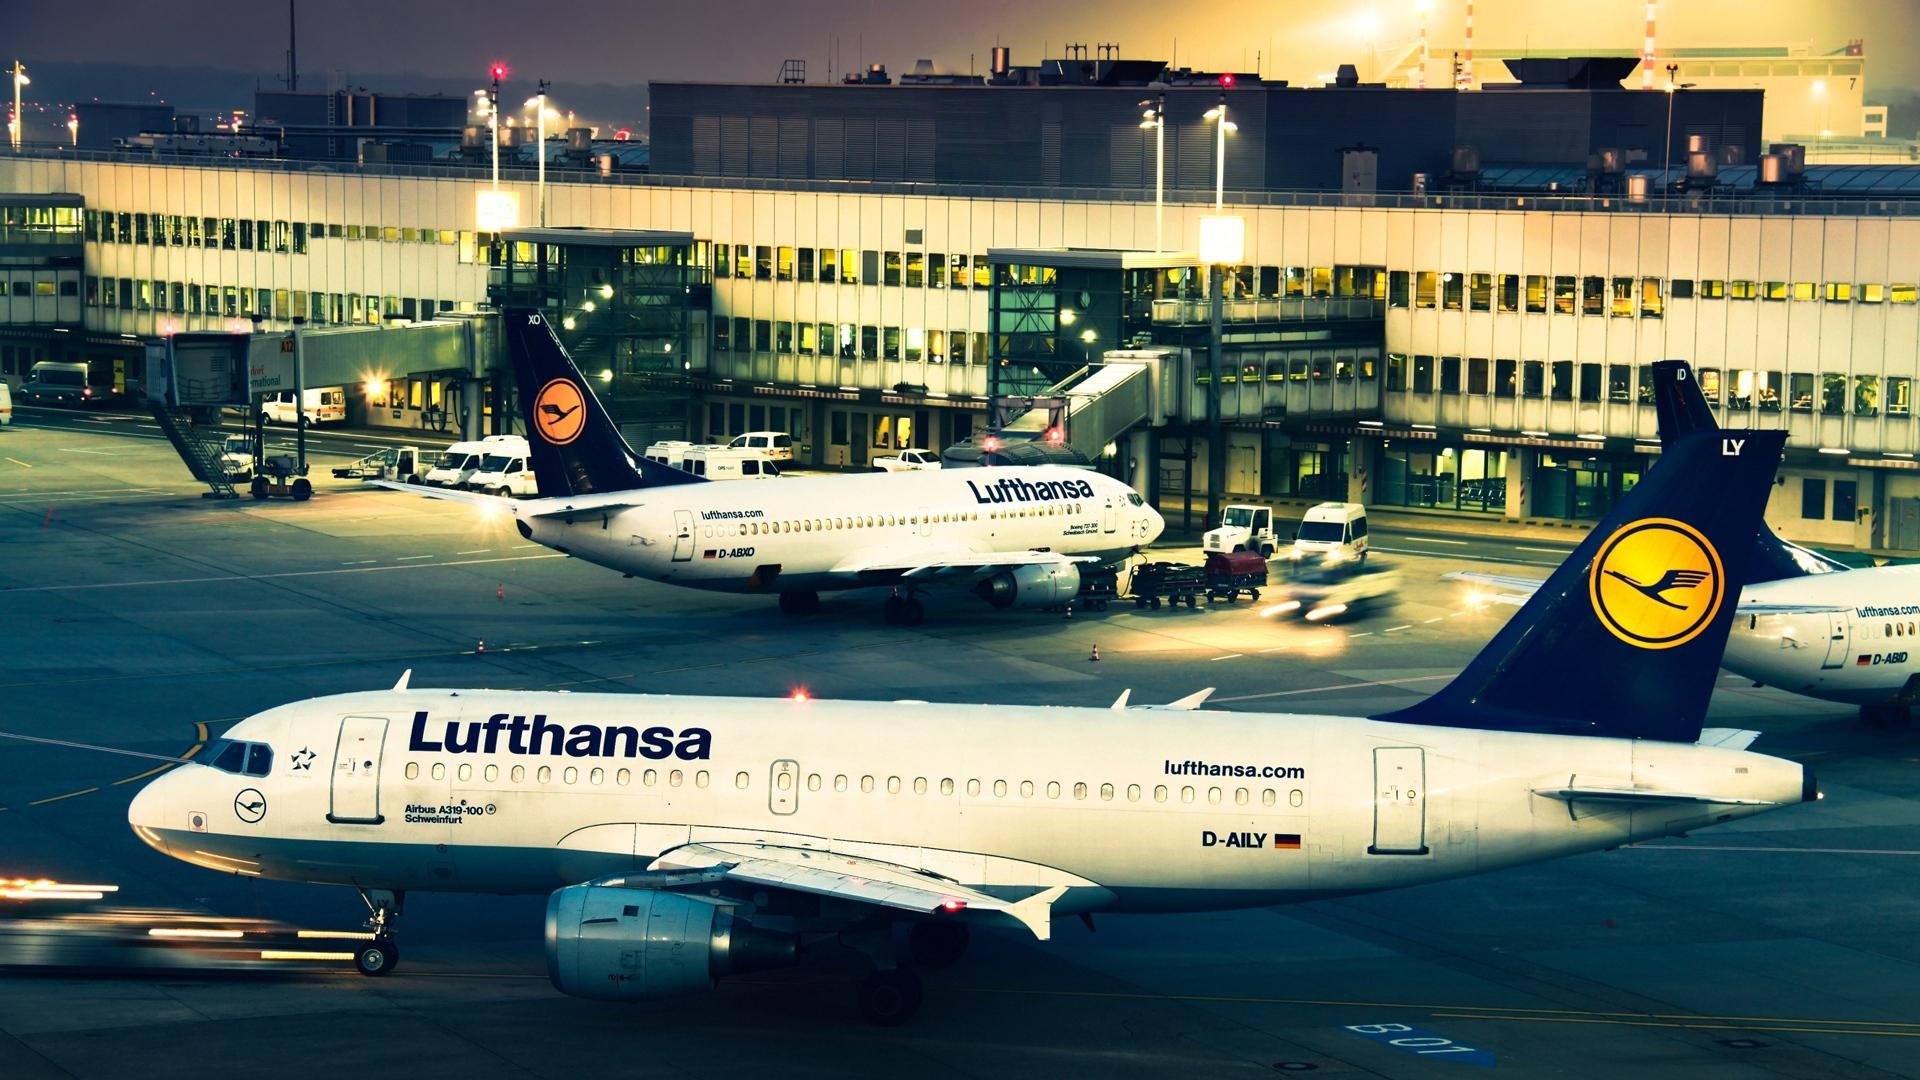 HDoboi.Kiev.ua - Самолет Airbus, обои на смартфон самолеты, авиация, Lufthansa